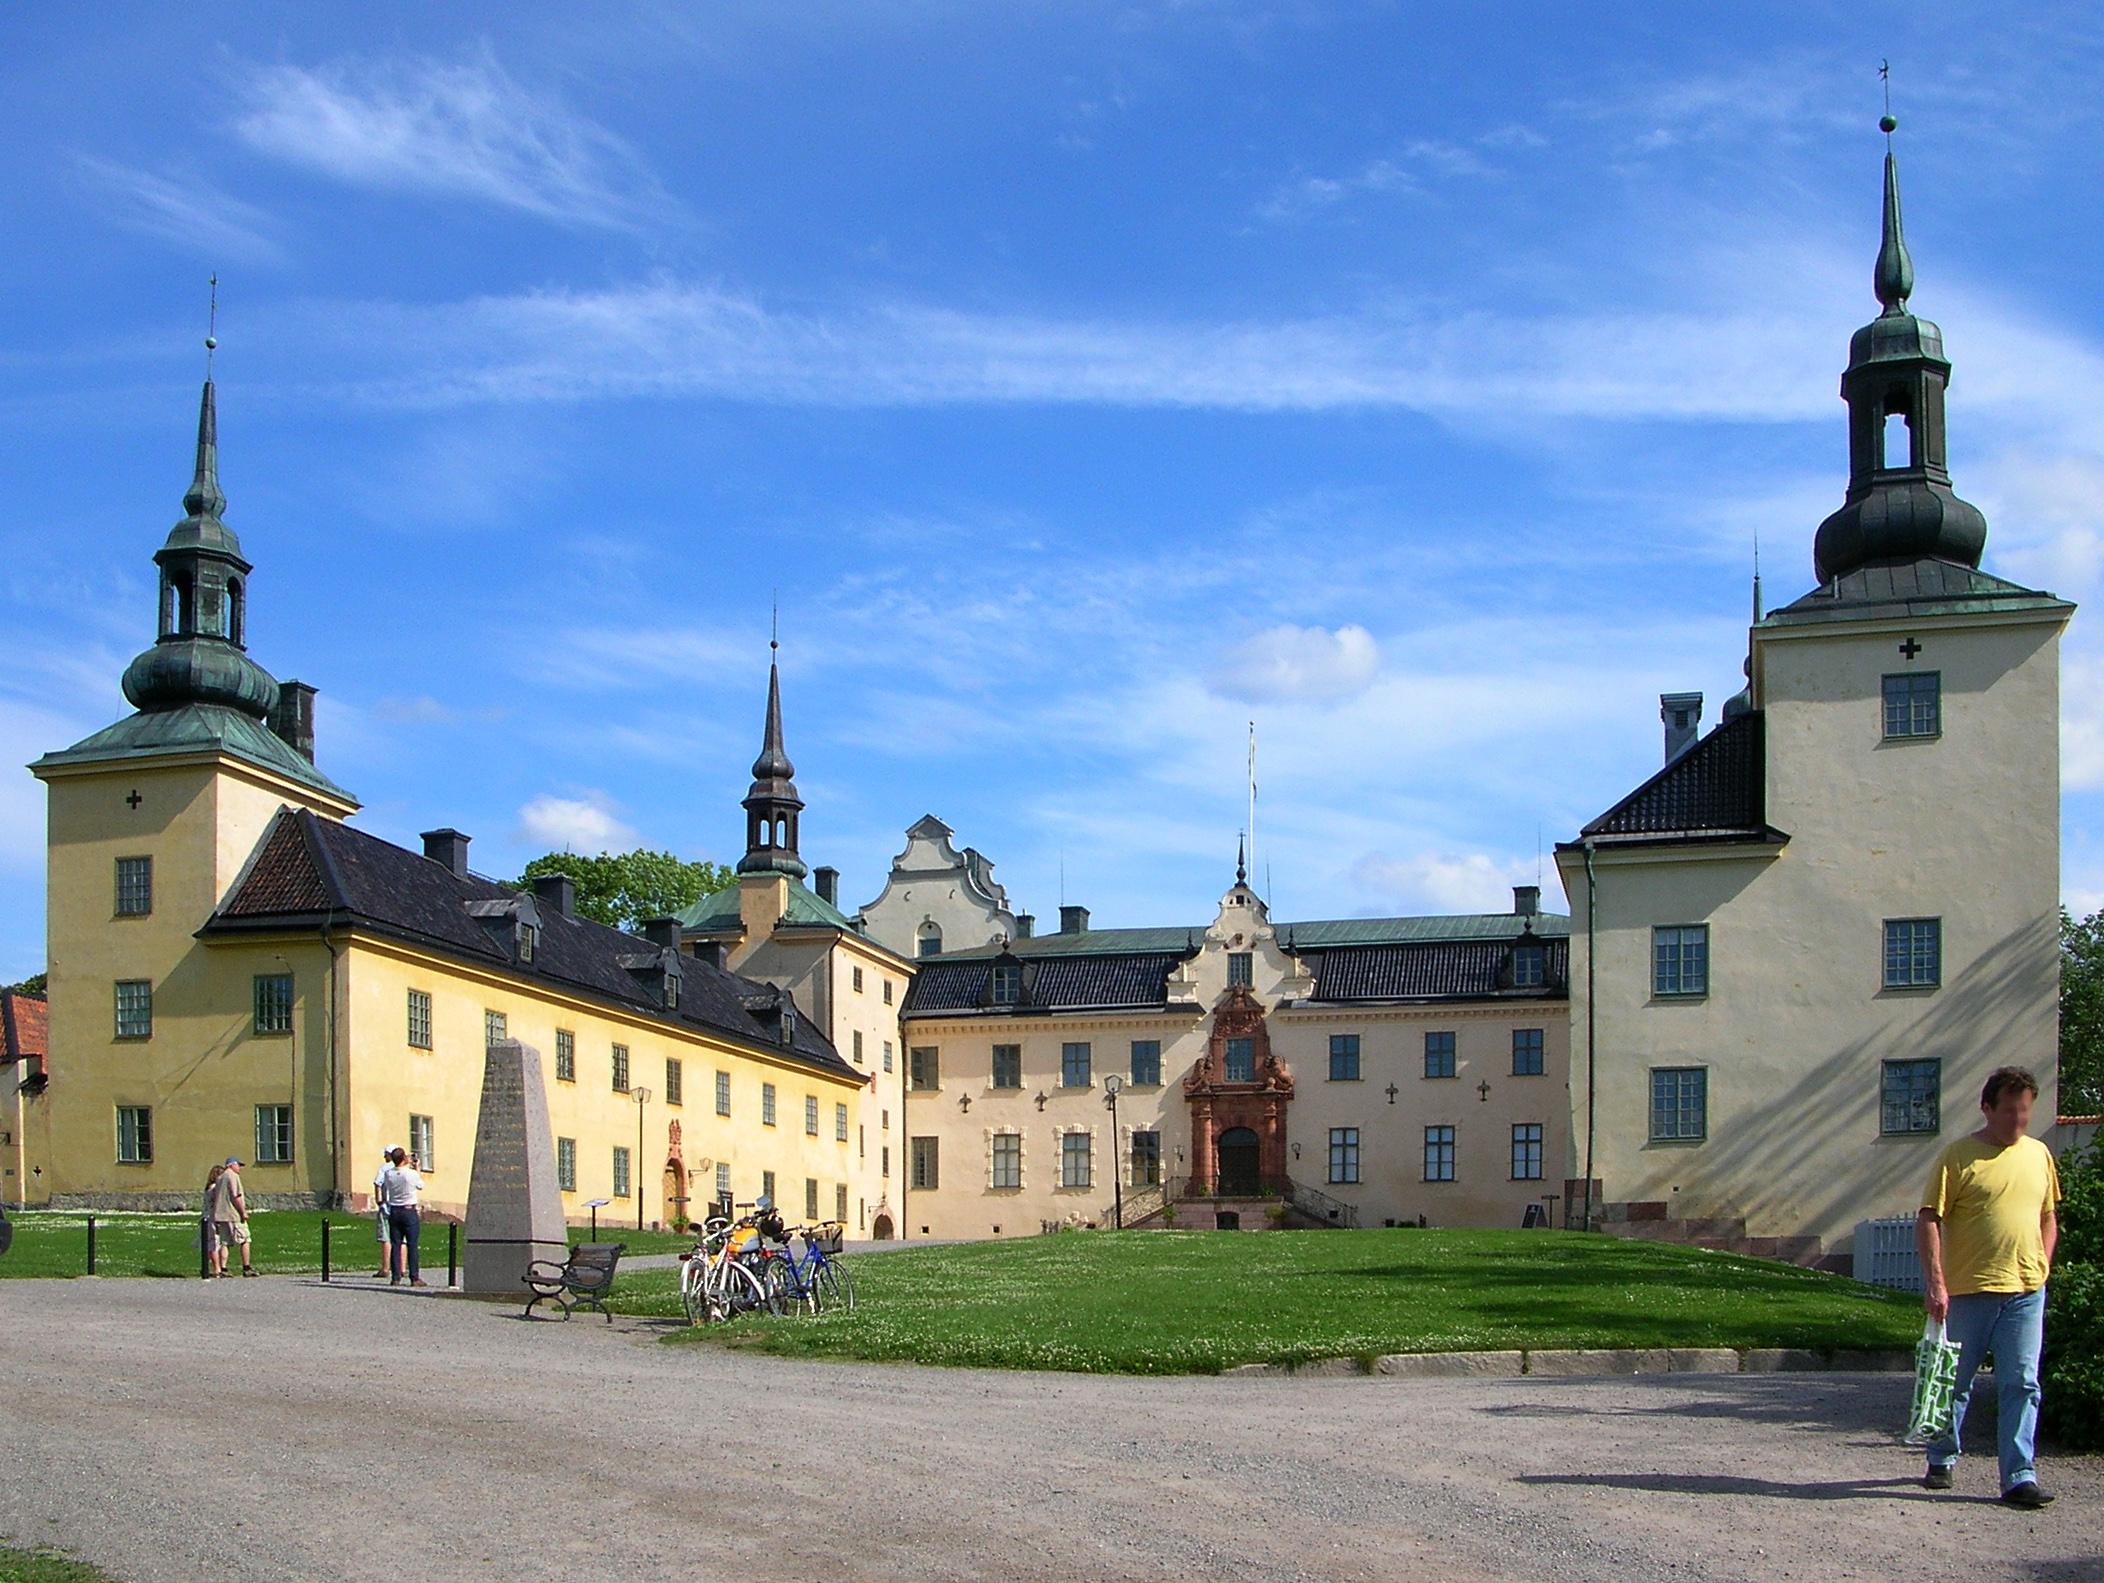 tyreso sweden